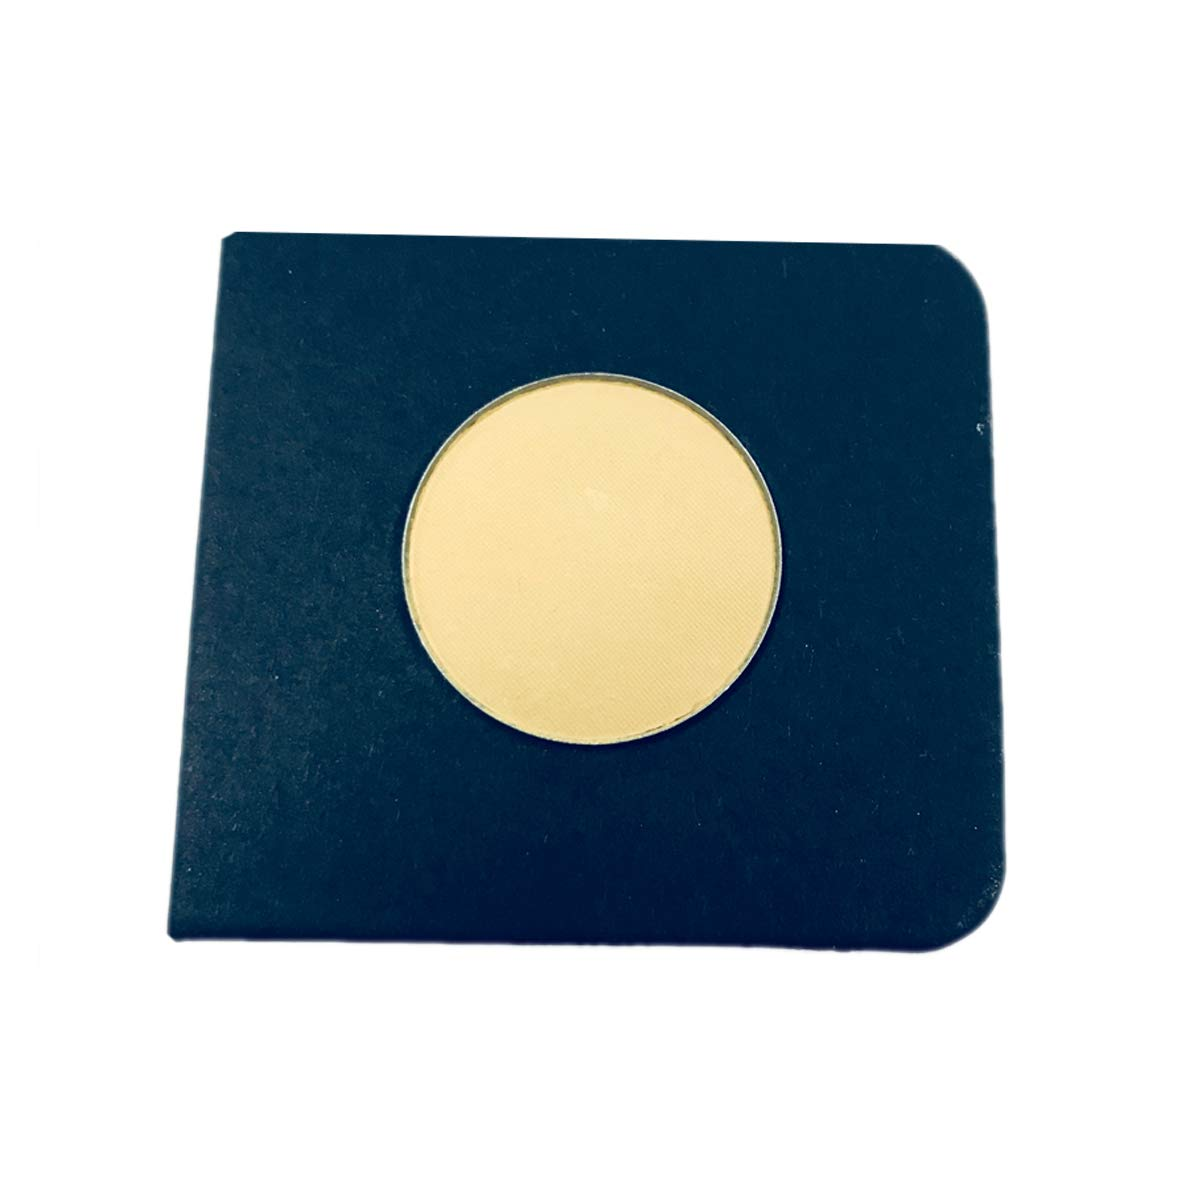 Everfavor Single Eye Shadow Compact, High Pigmented Blendable Eyeshadow Makeup Refill Pan 26mm (Moon)